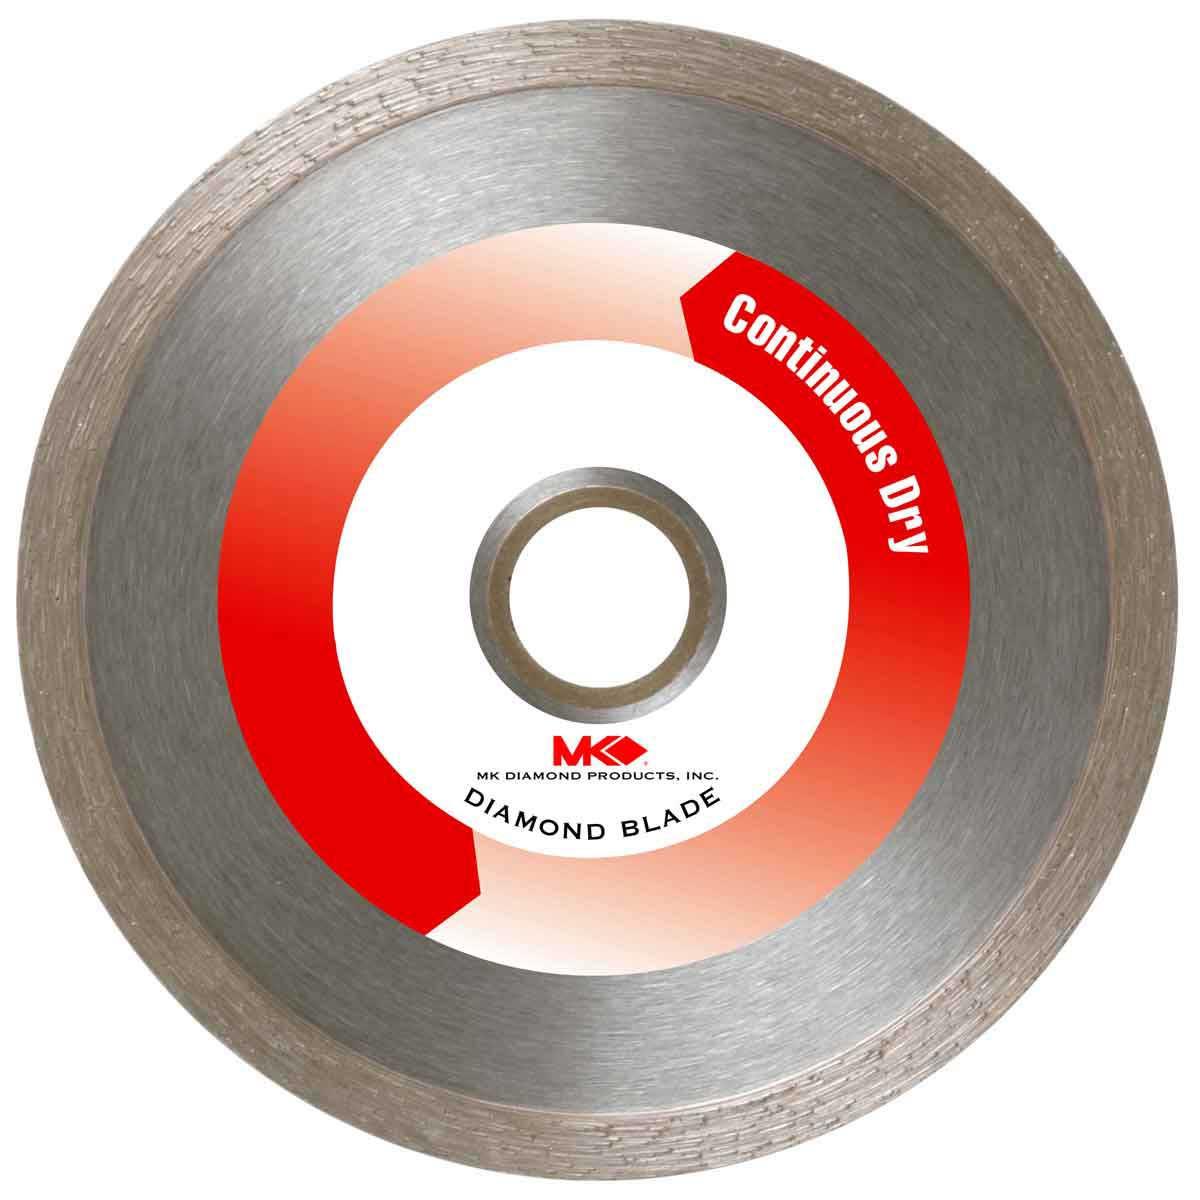 mk-404cr dry cutting diamond blade